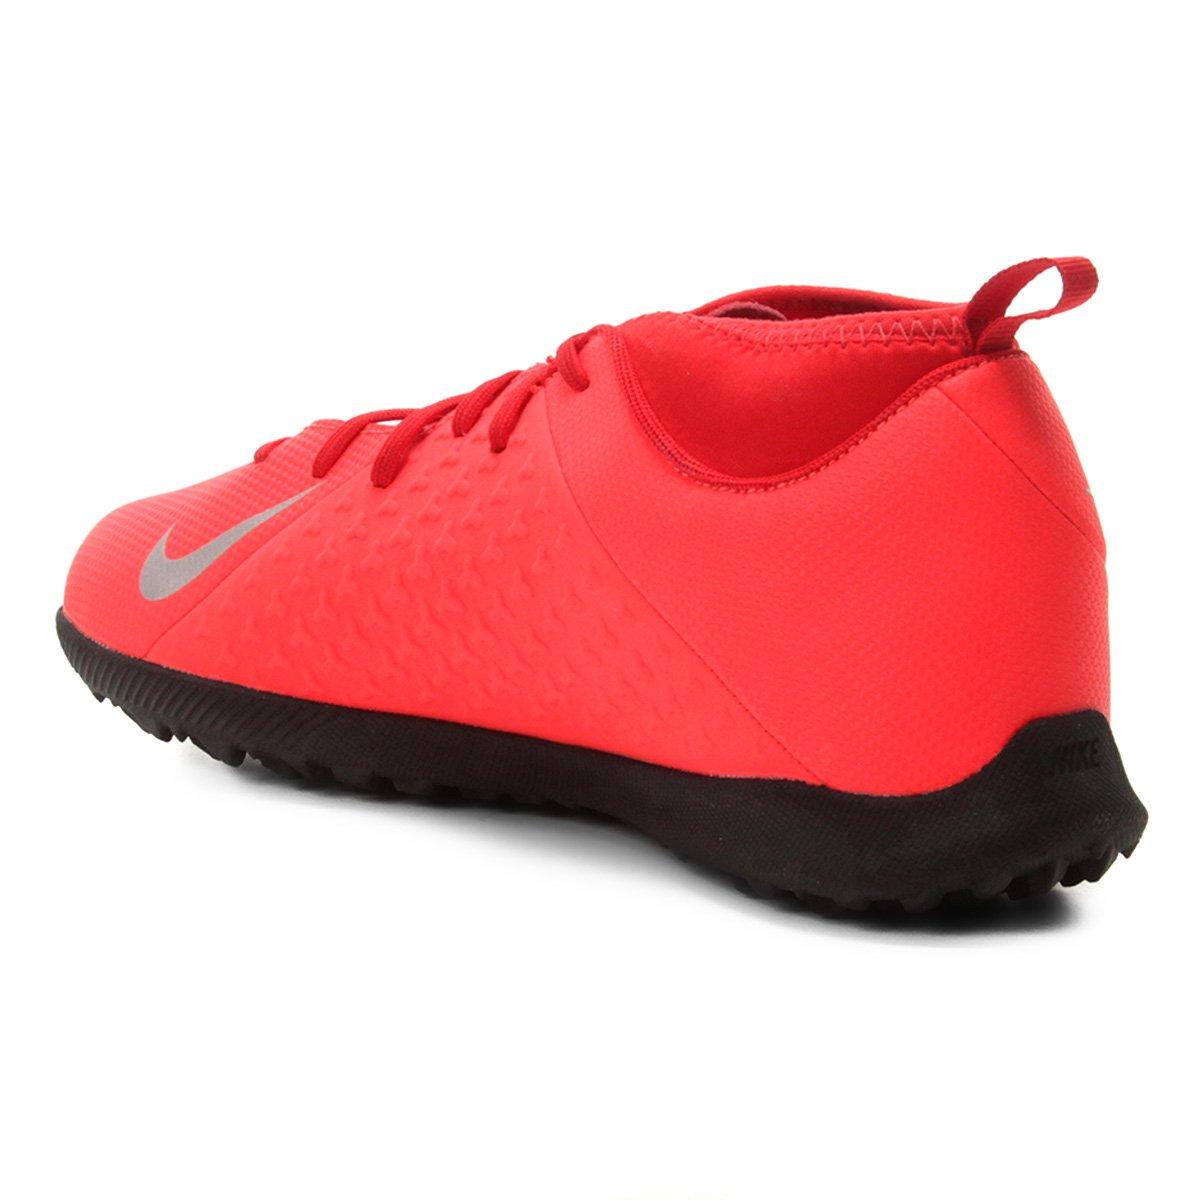 dd69f591b3 Chuteira Society Infantil Nike Phantom Vision Club TF - Vermelho e ...